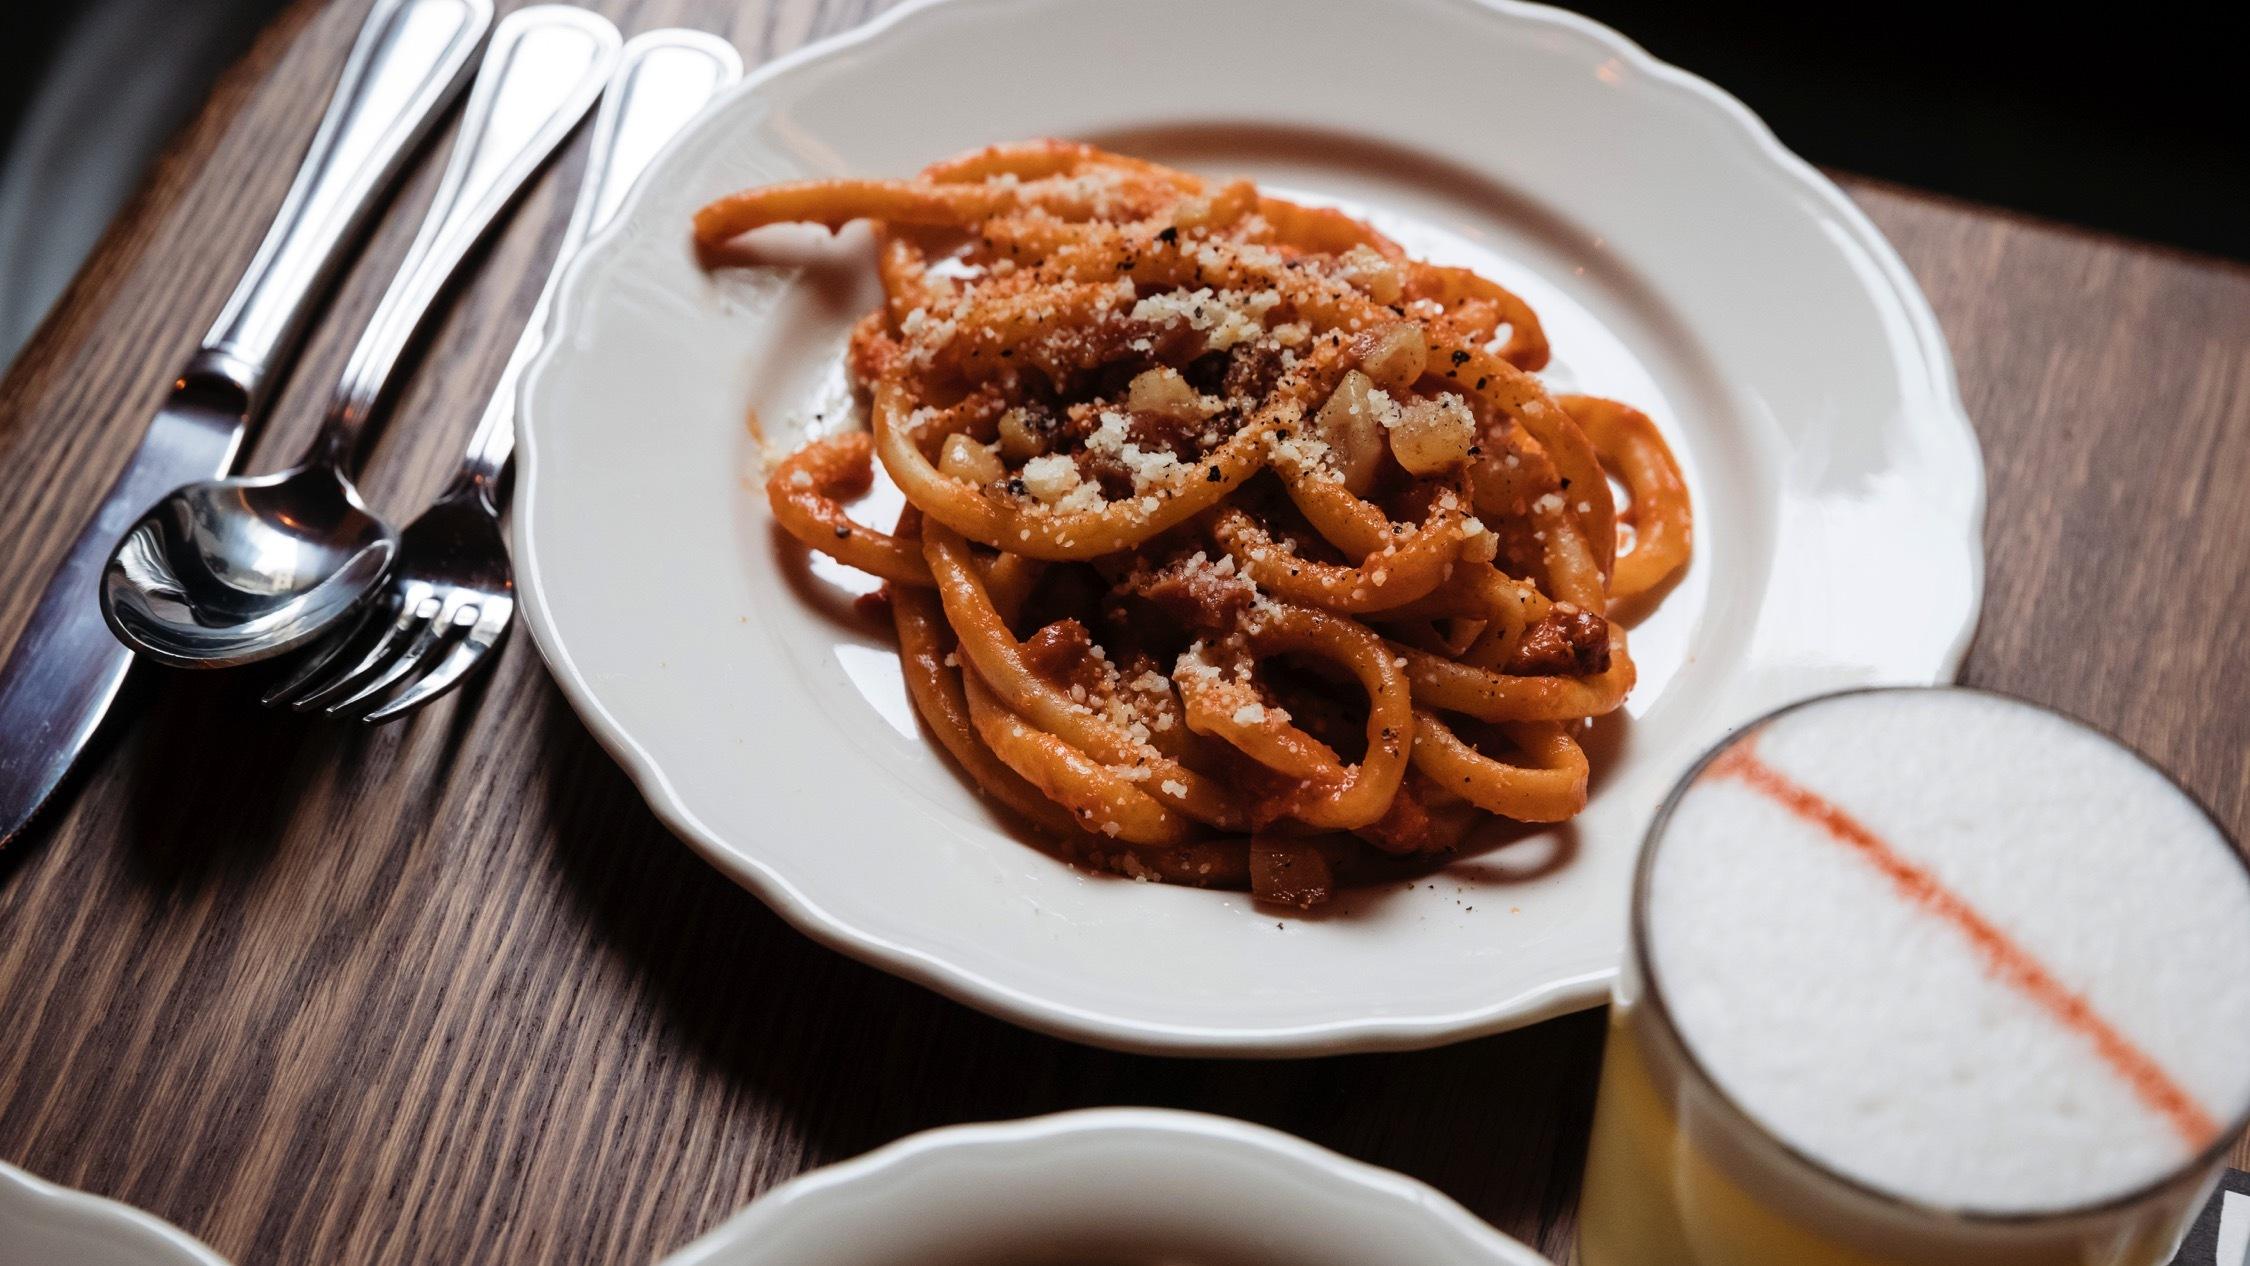 Food at Alberto's Lounge